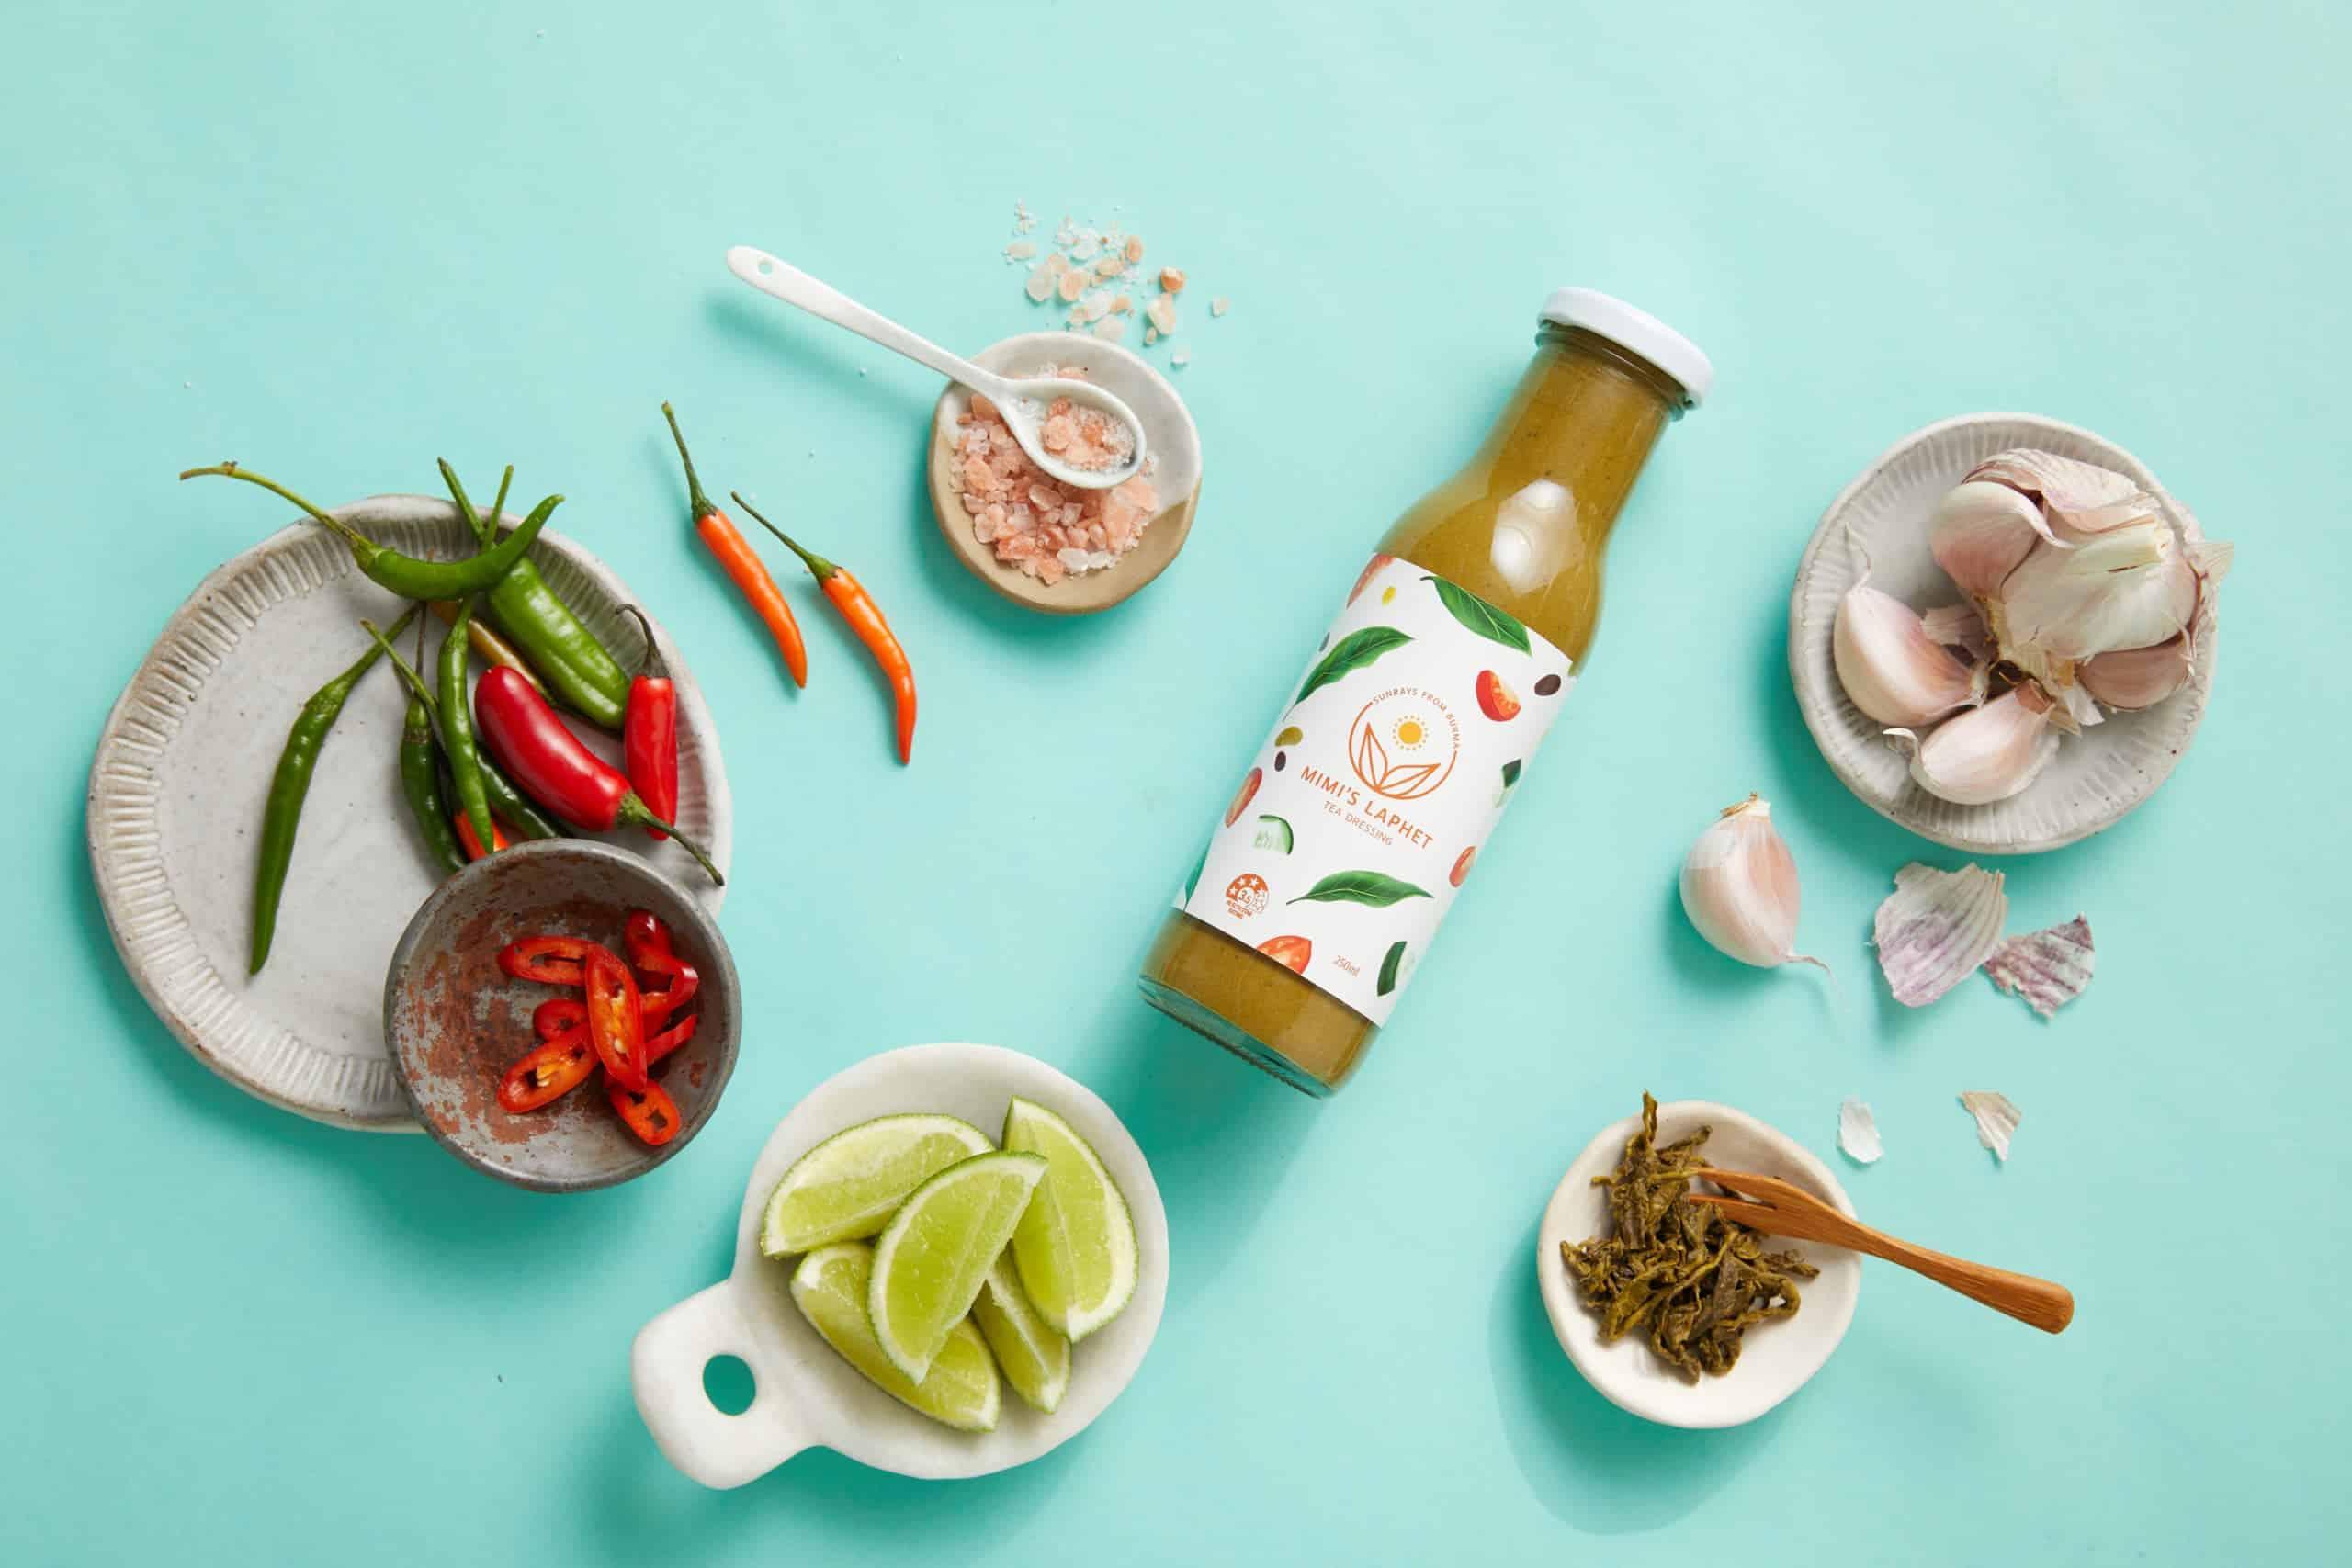 Natural, vegan, gluten free tea dressing - Mimi's Laphet